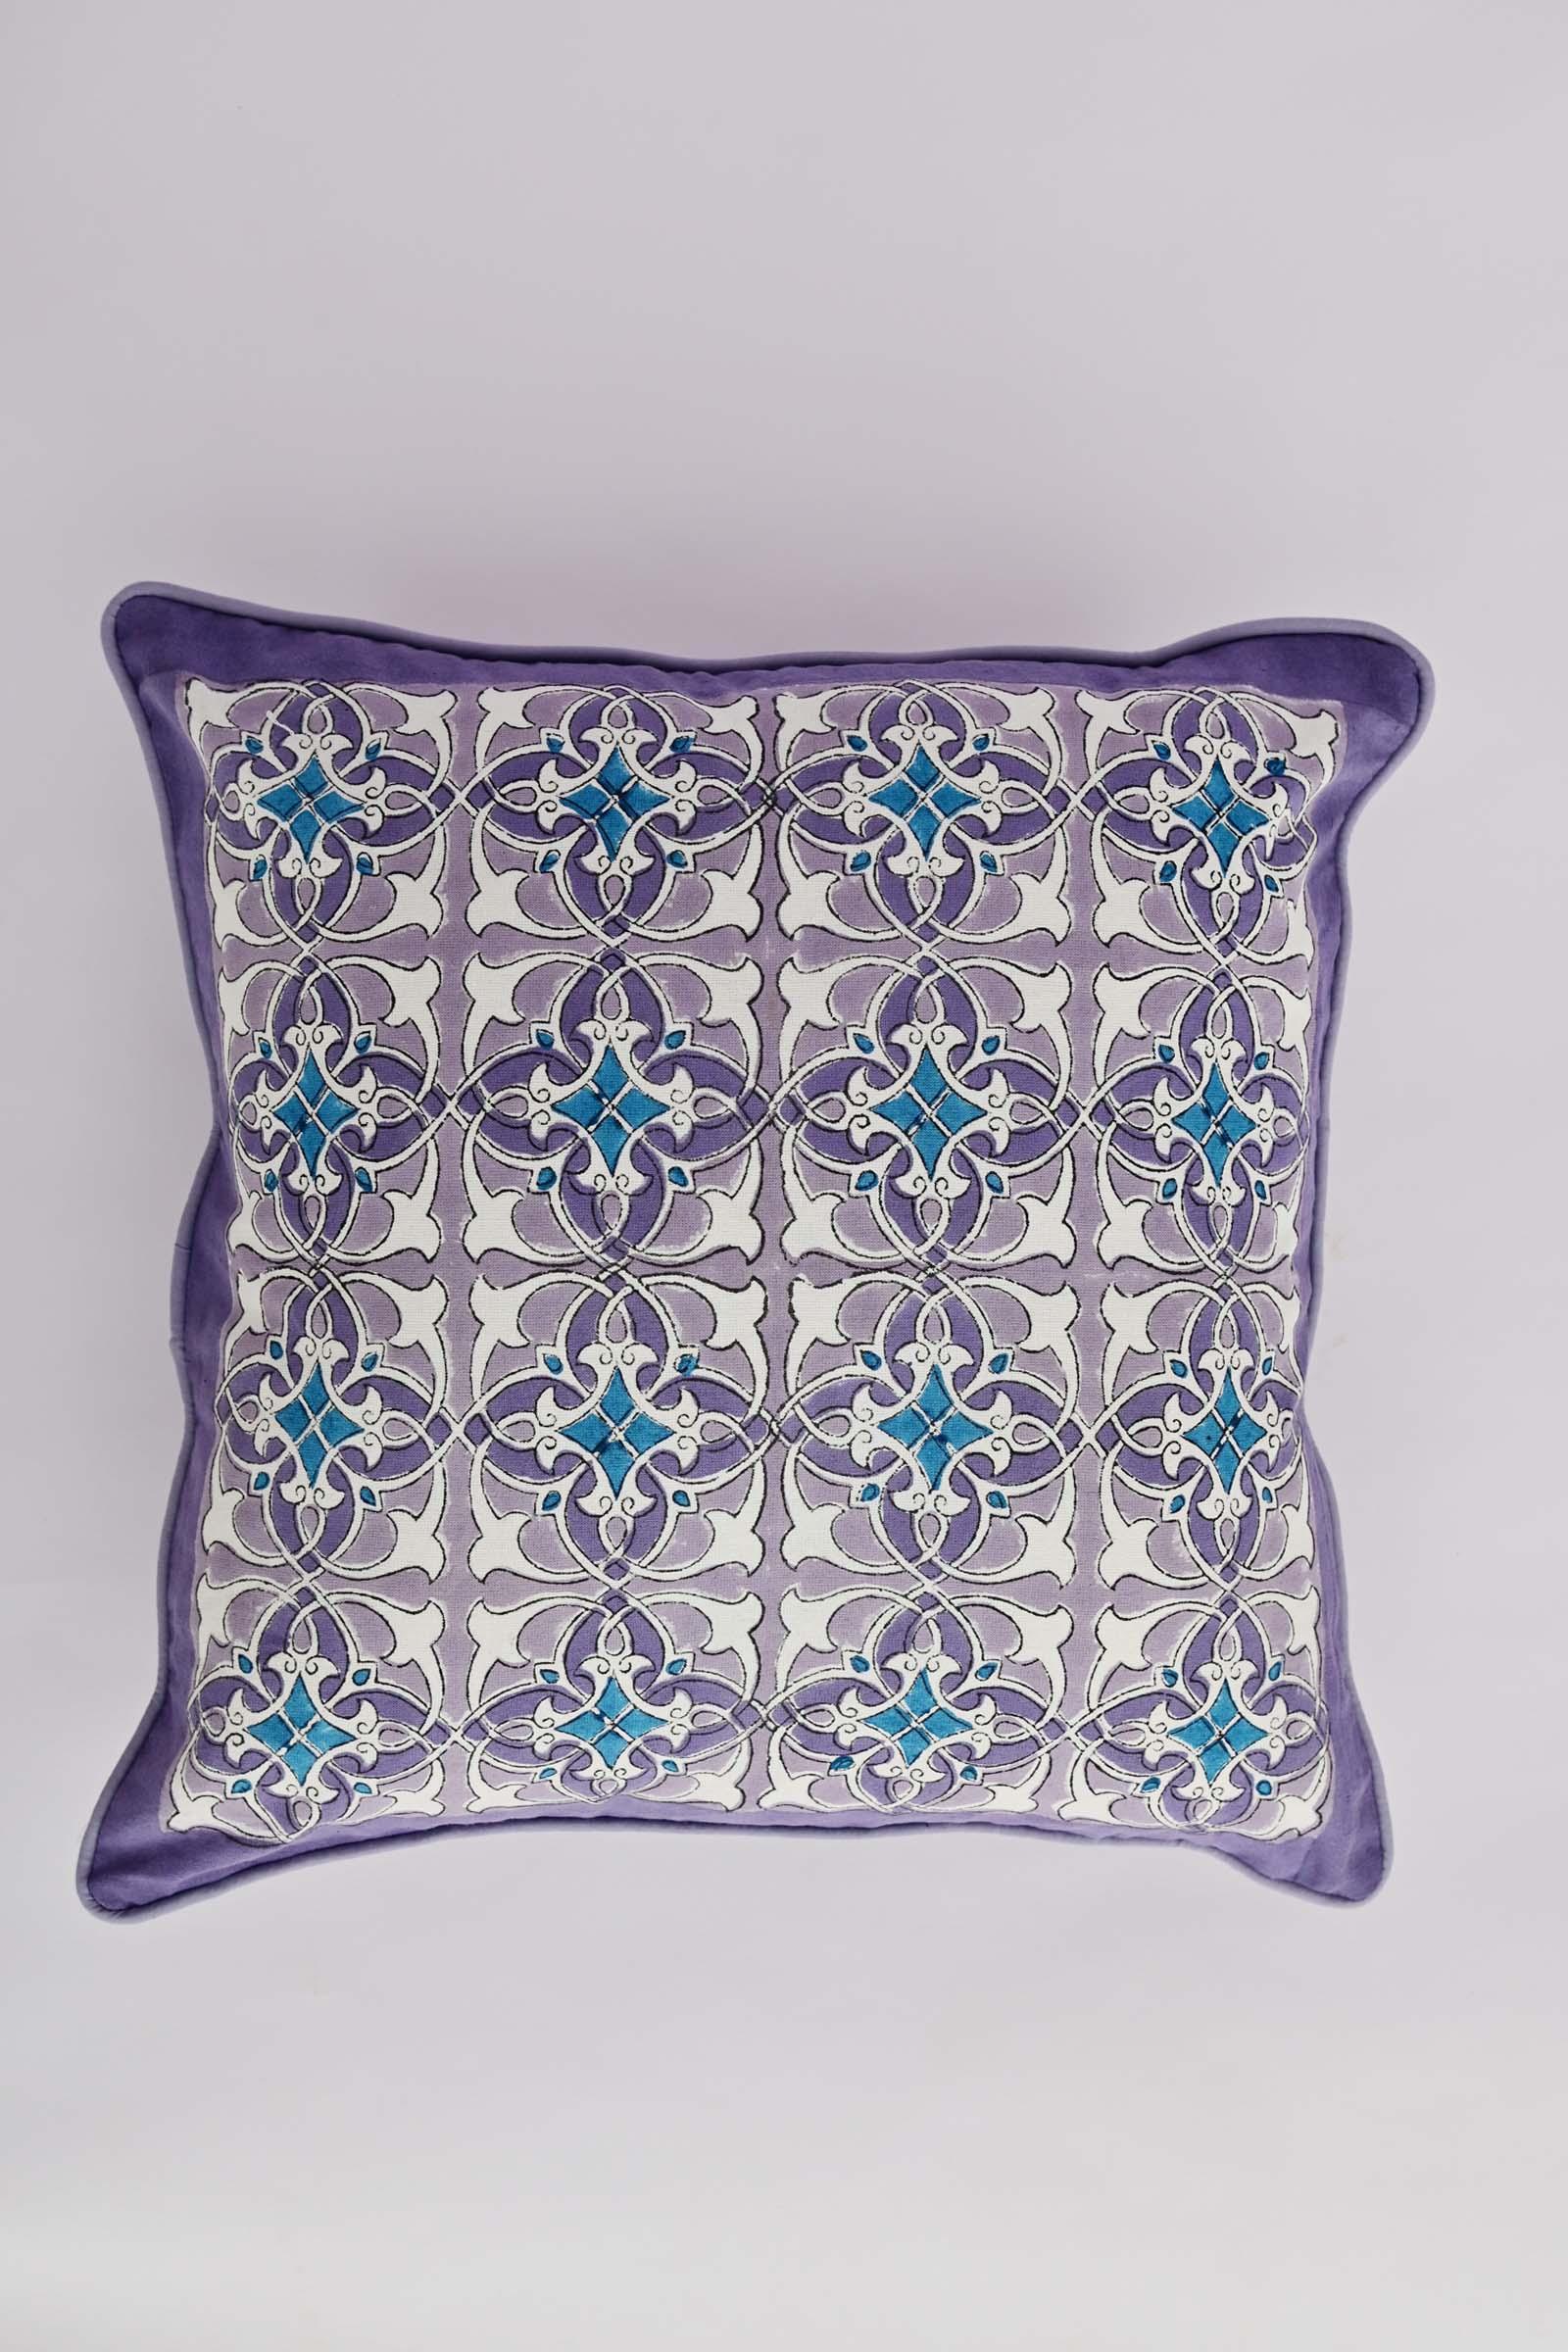 Artistic Lavender 16*16 Cushion Cover